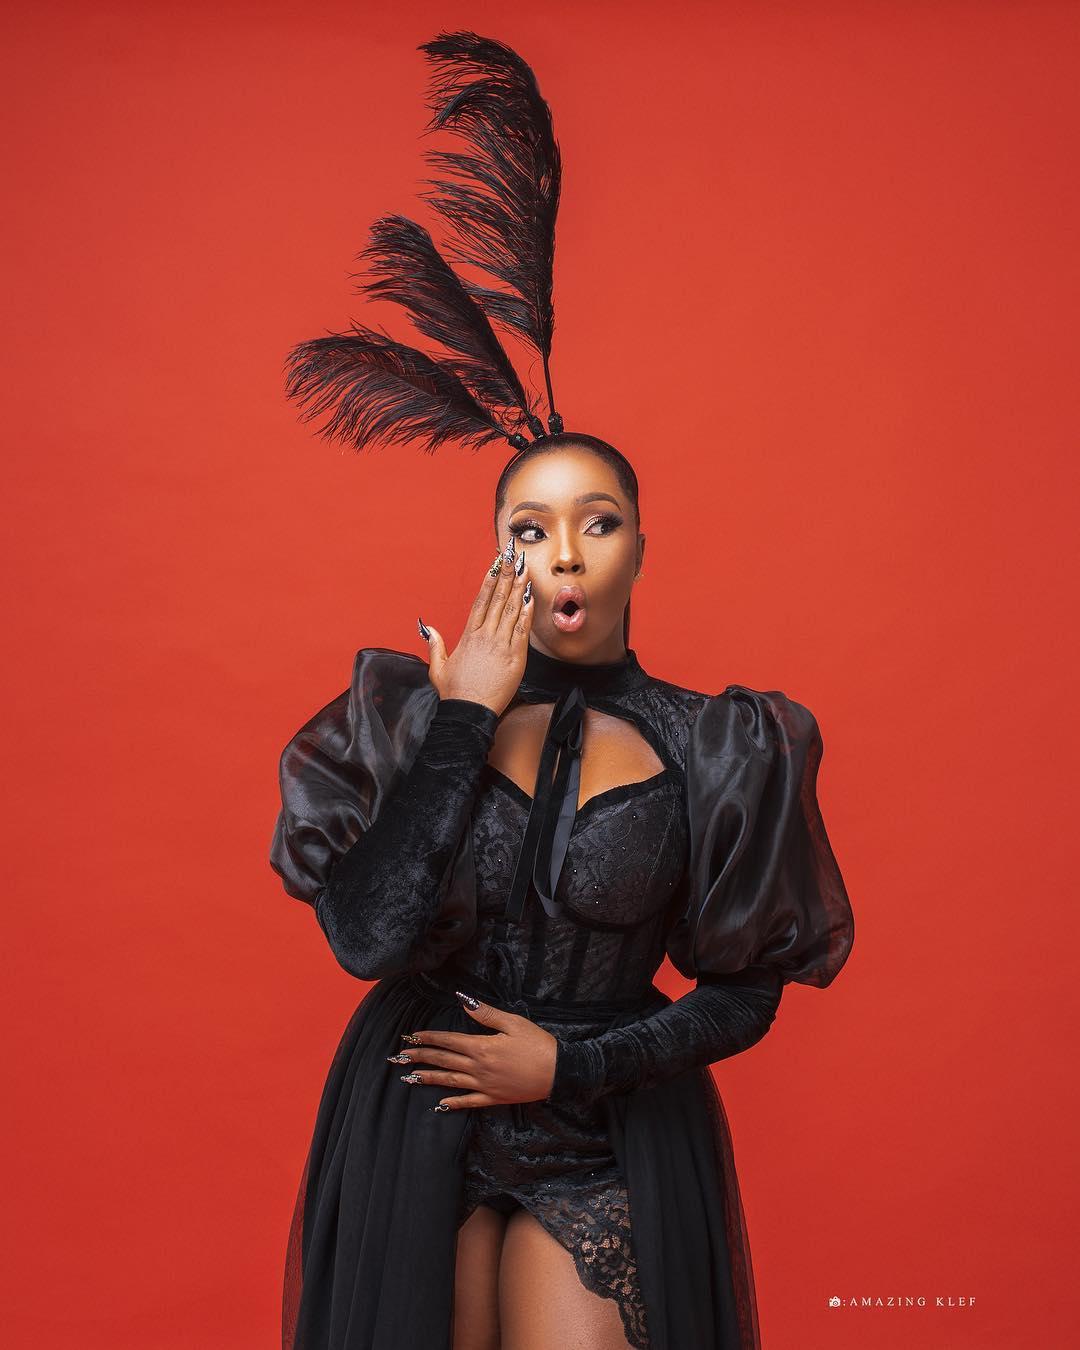 jaiyeorie = BLACK BEAUTY: Bambam  in New Photos for Birthday